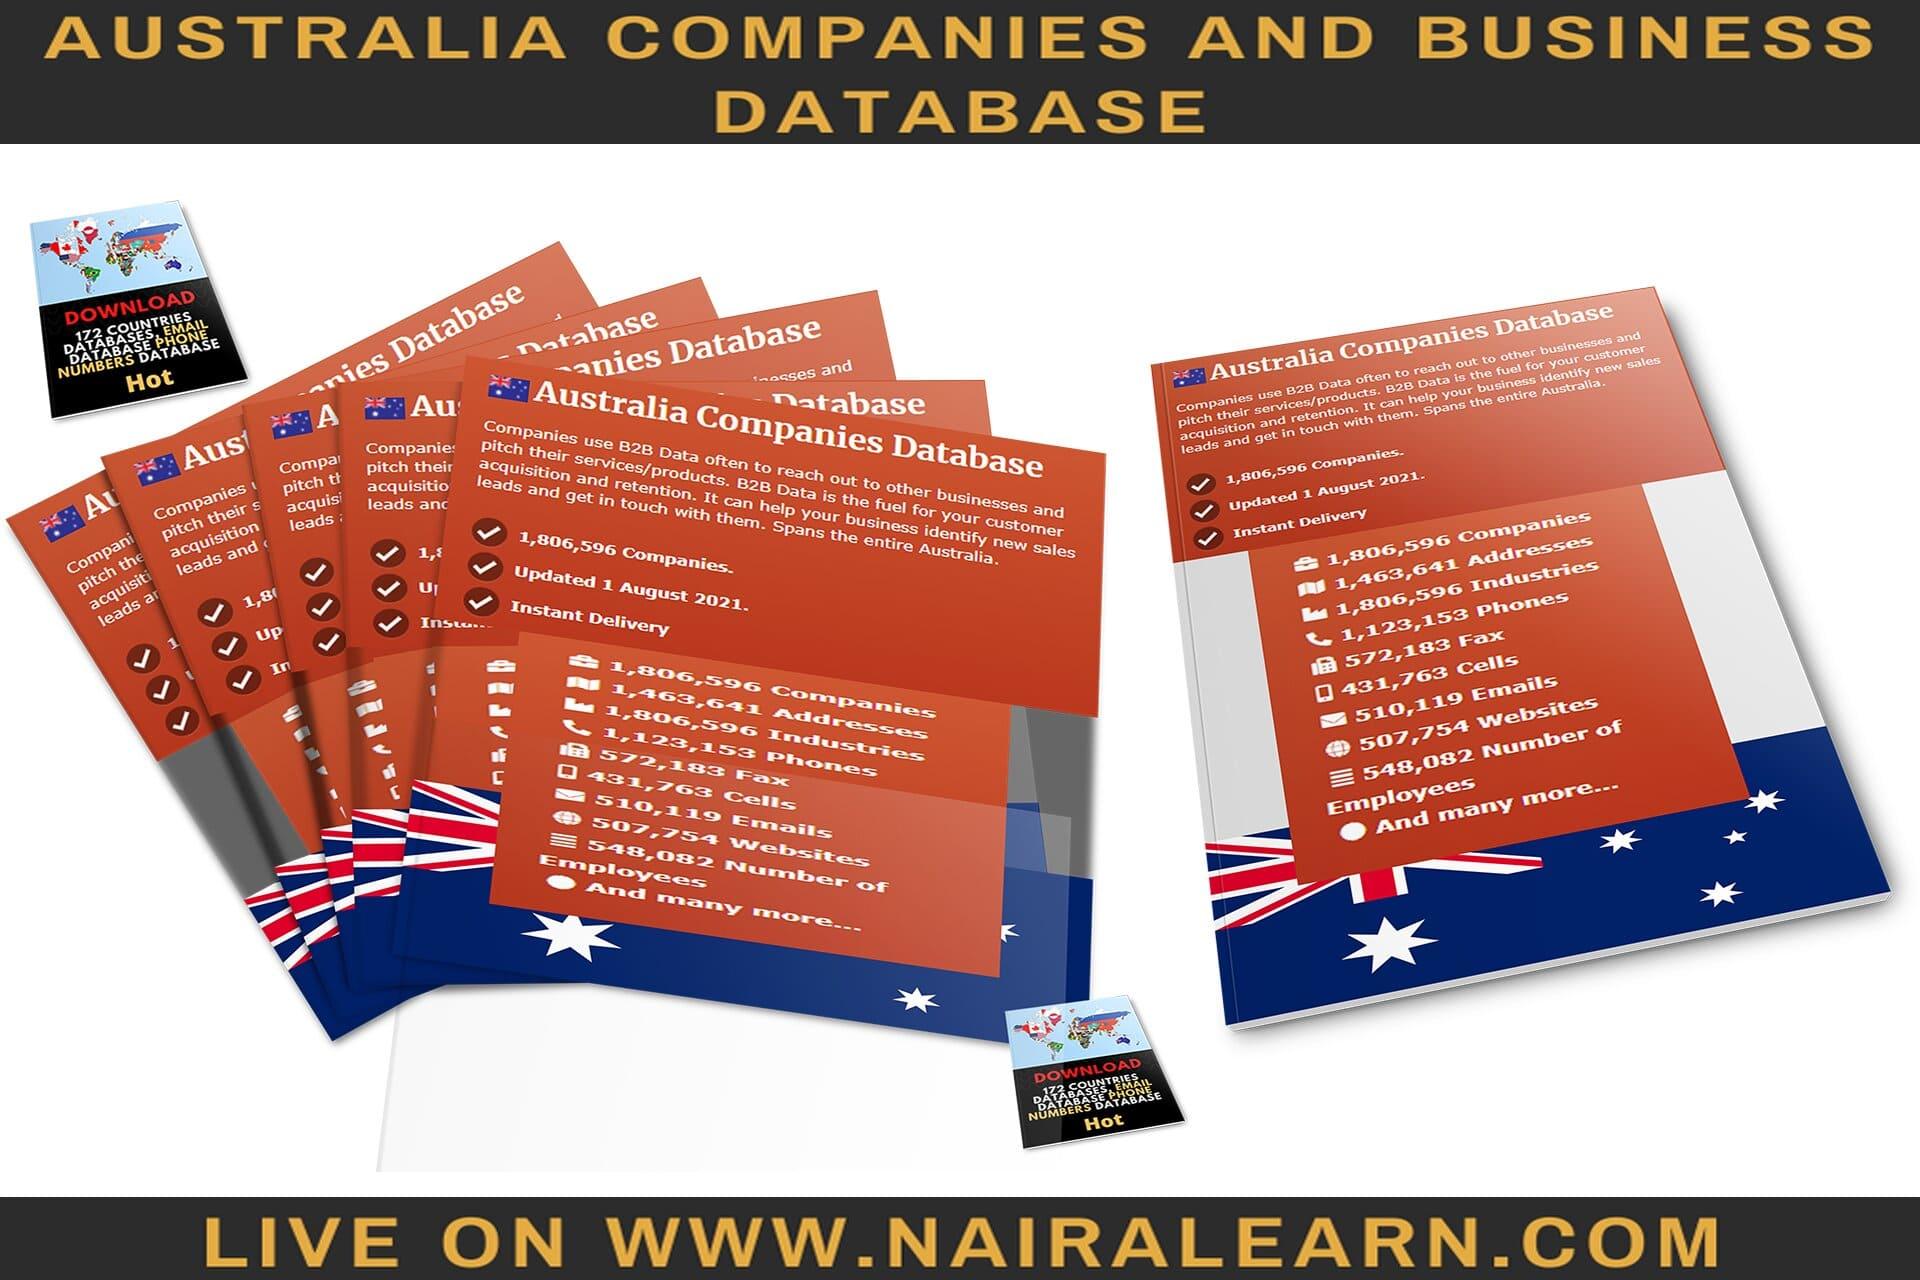 Australia Companies and Business Database